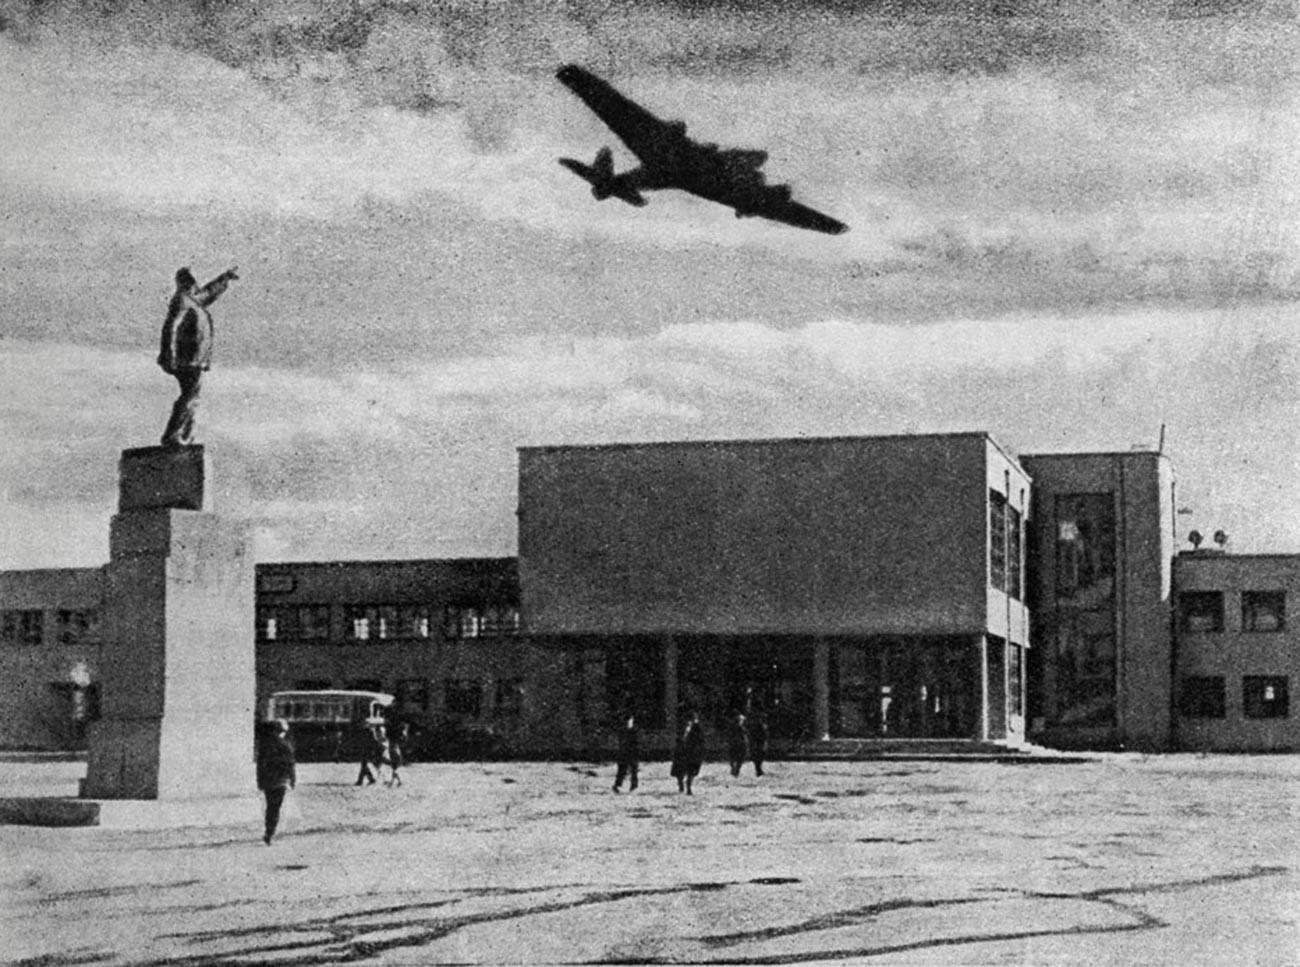 Aérodrome de Khodynskoïe Pole